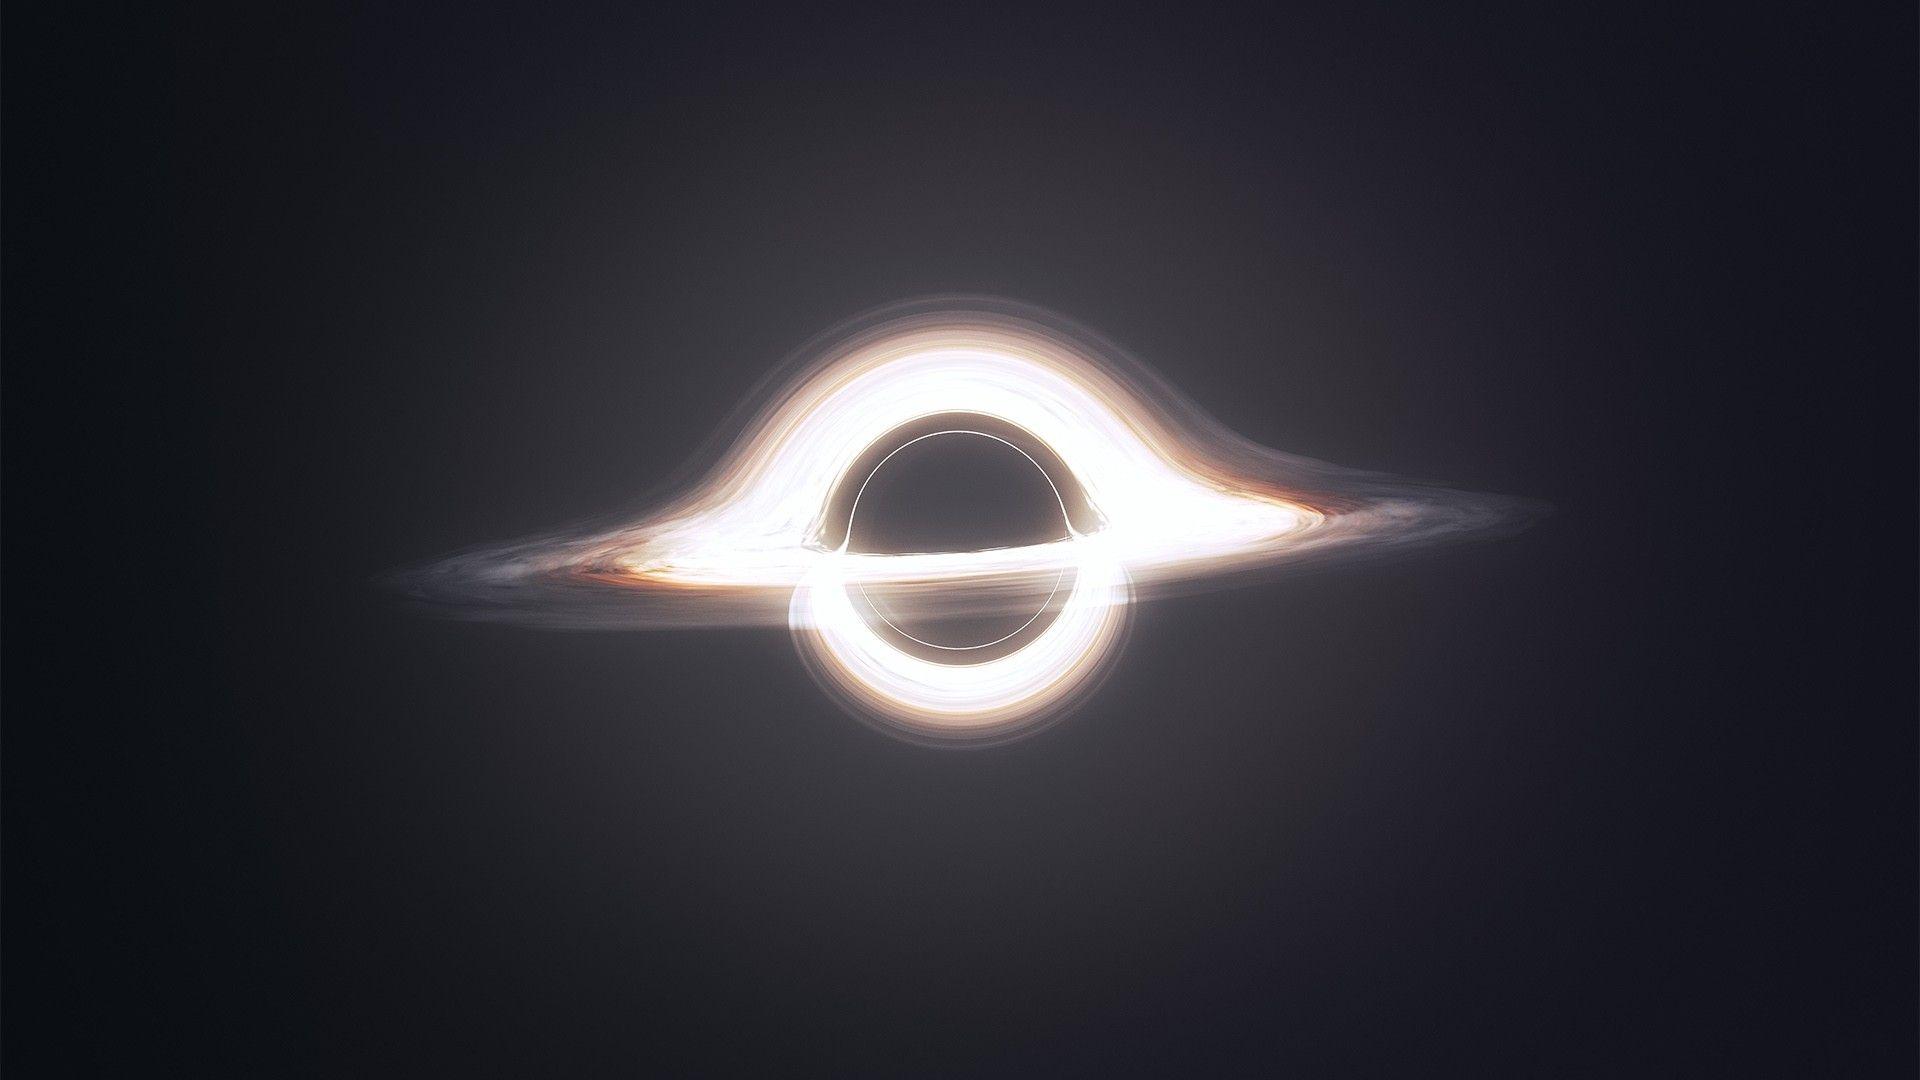 Black Hole Interstellar, Image